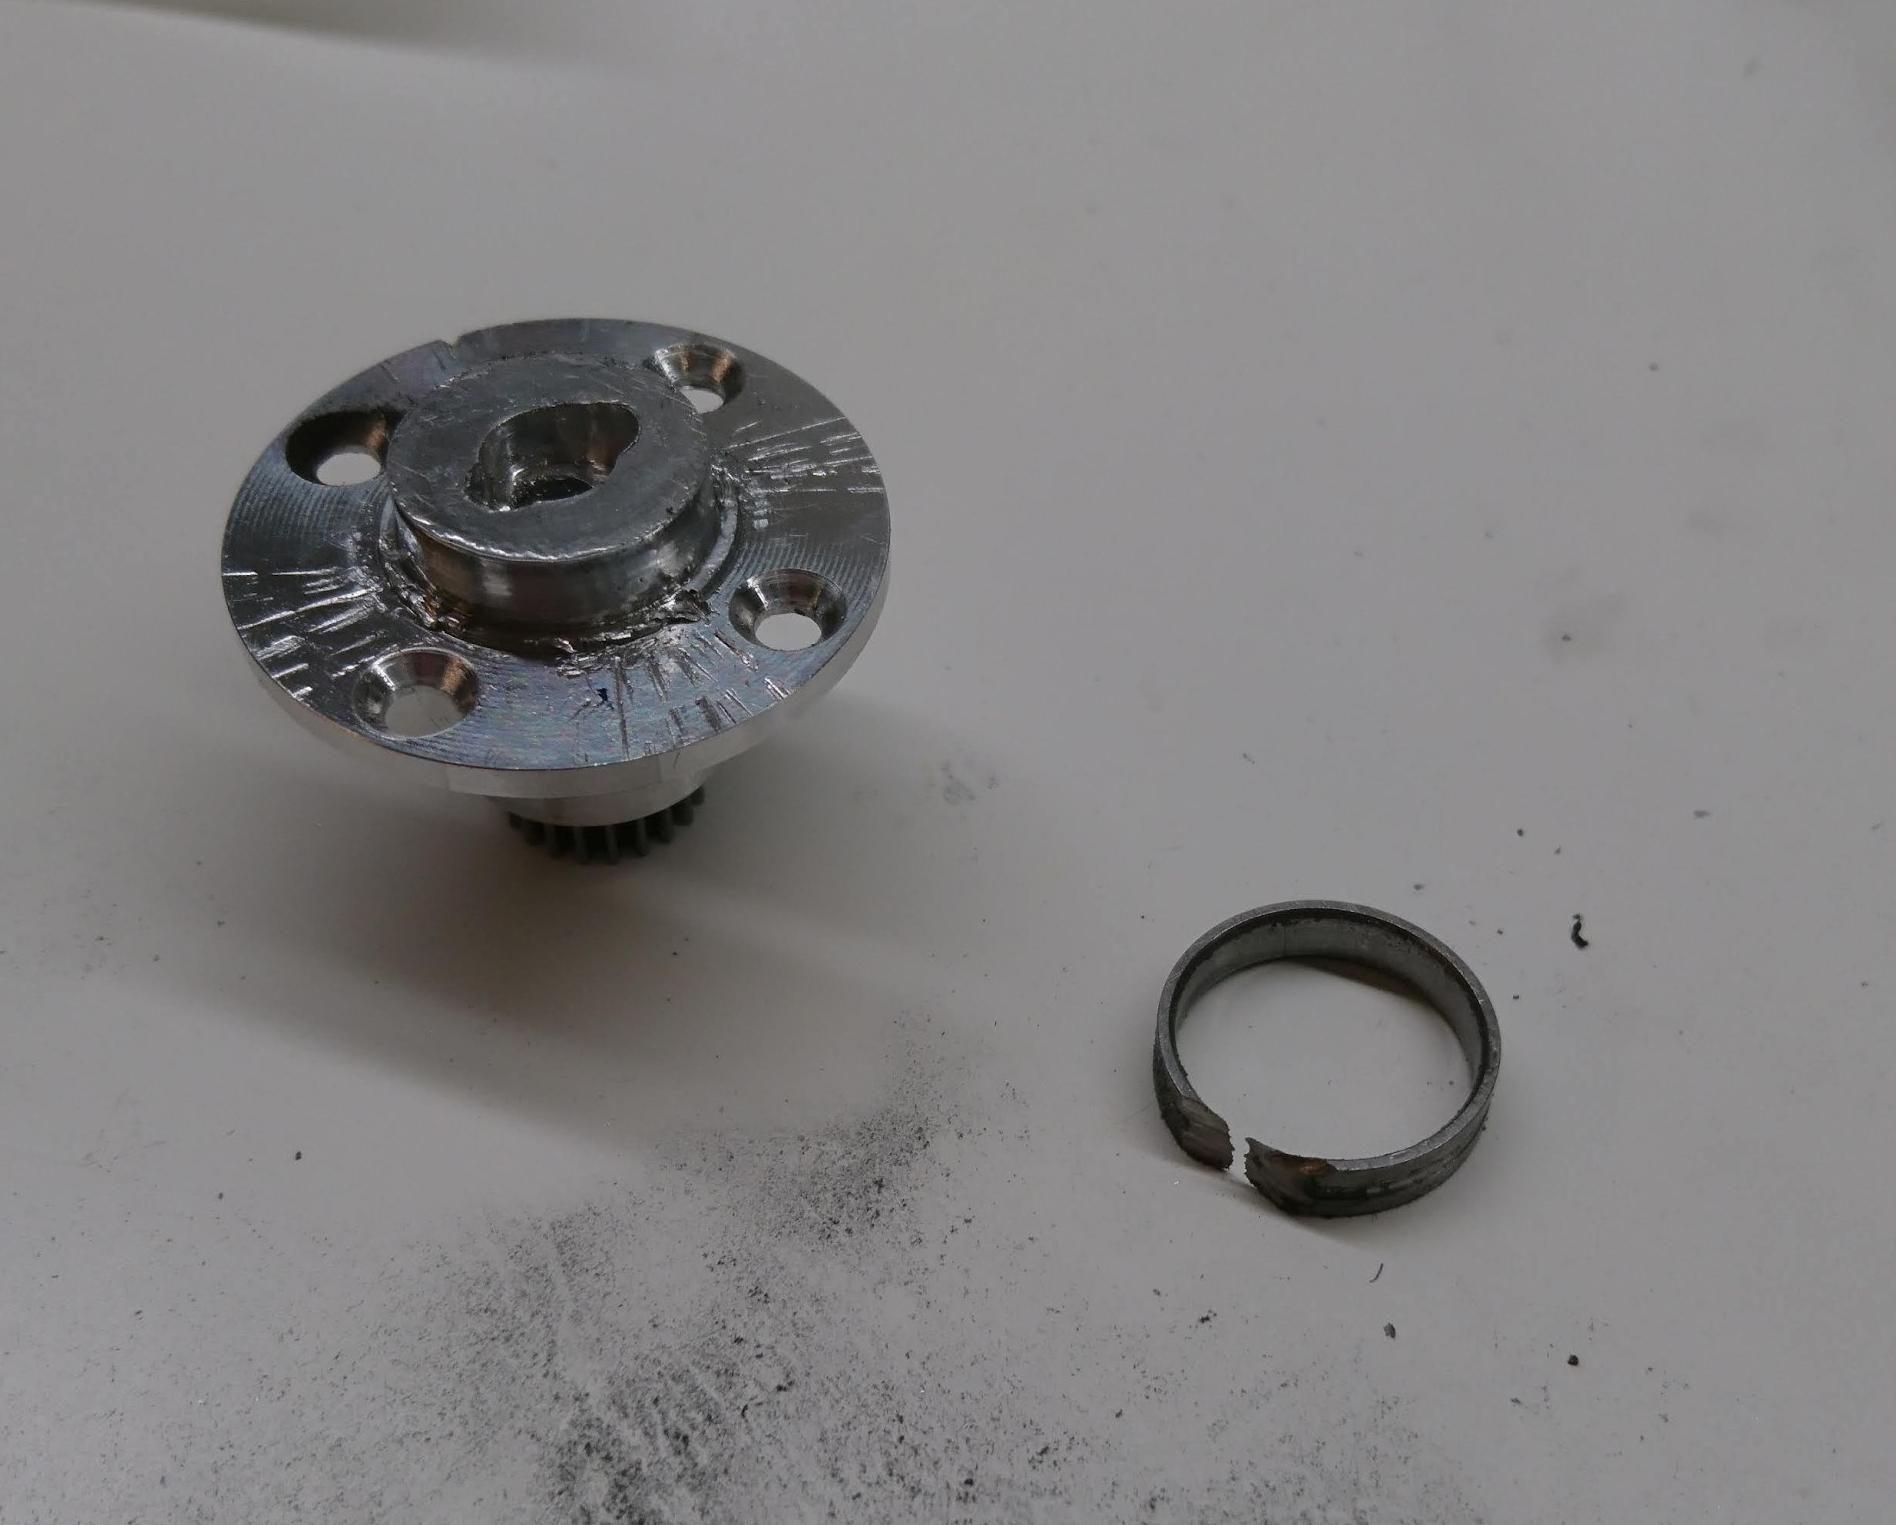 Rotor bearing removed